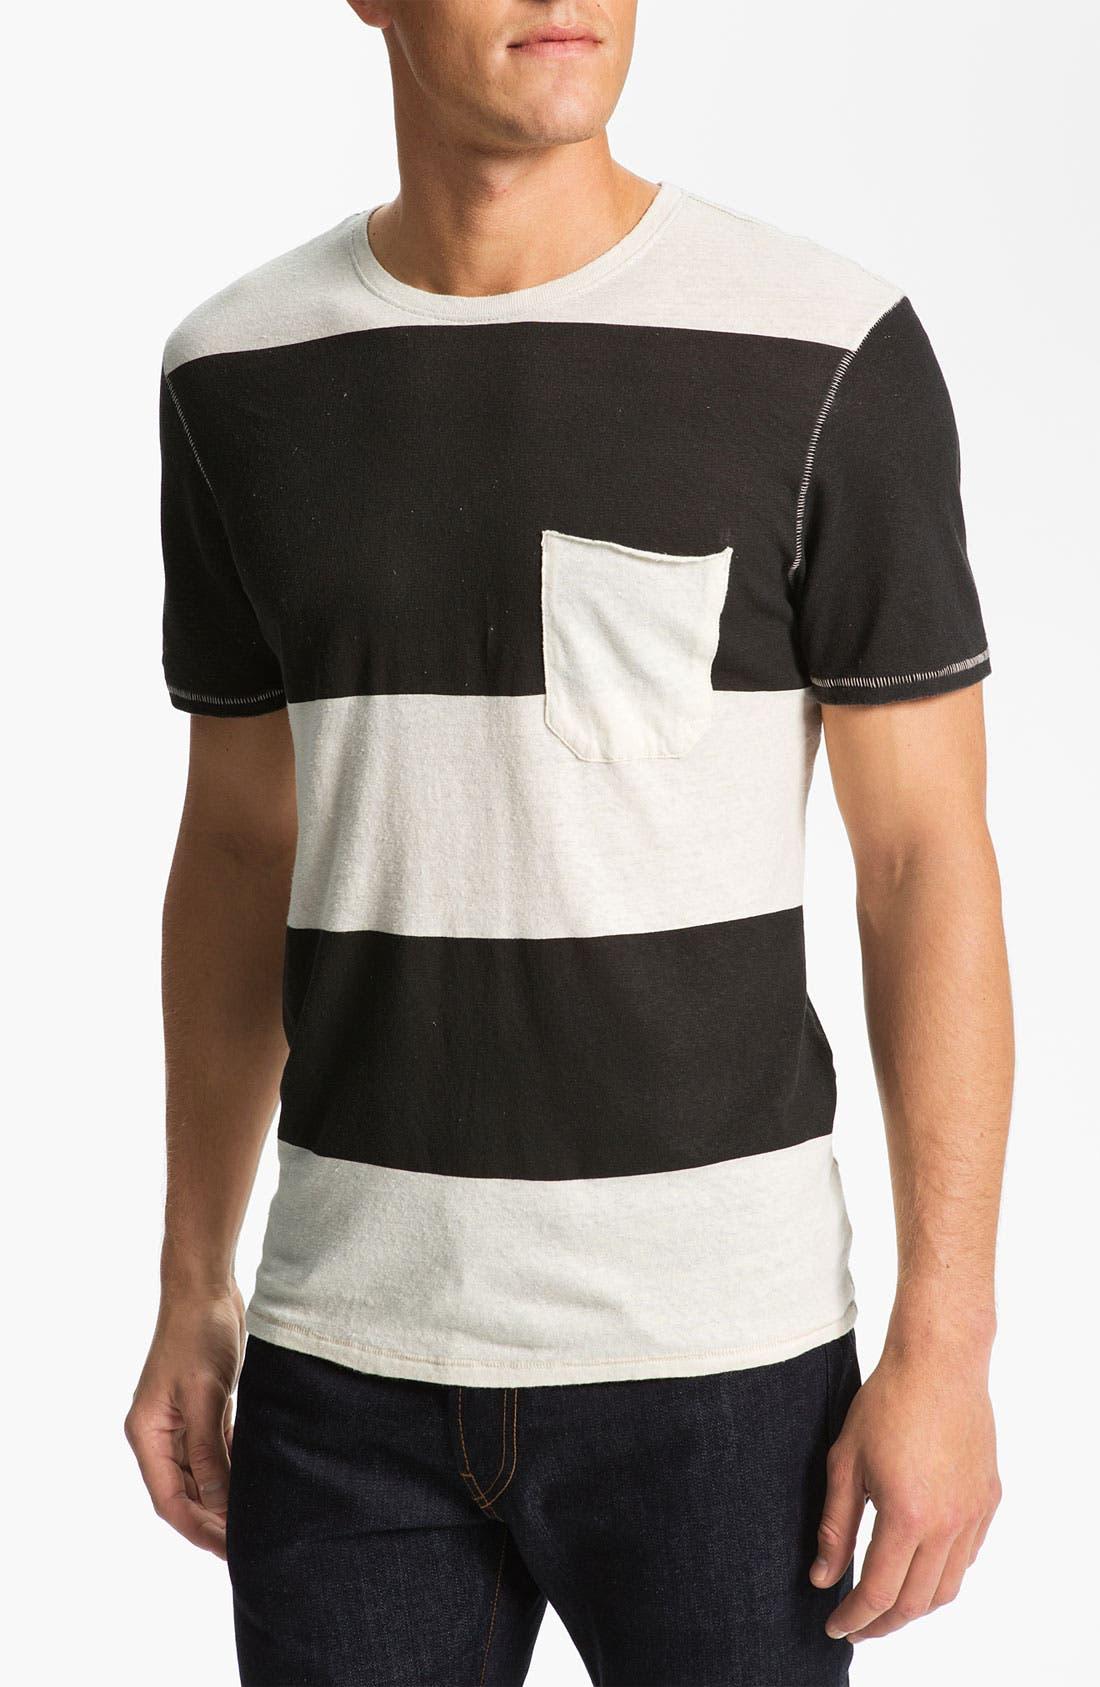 Alternate Image 1 Selected - R44 Rogan Standard Issue 'Condor' T-Shirt